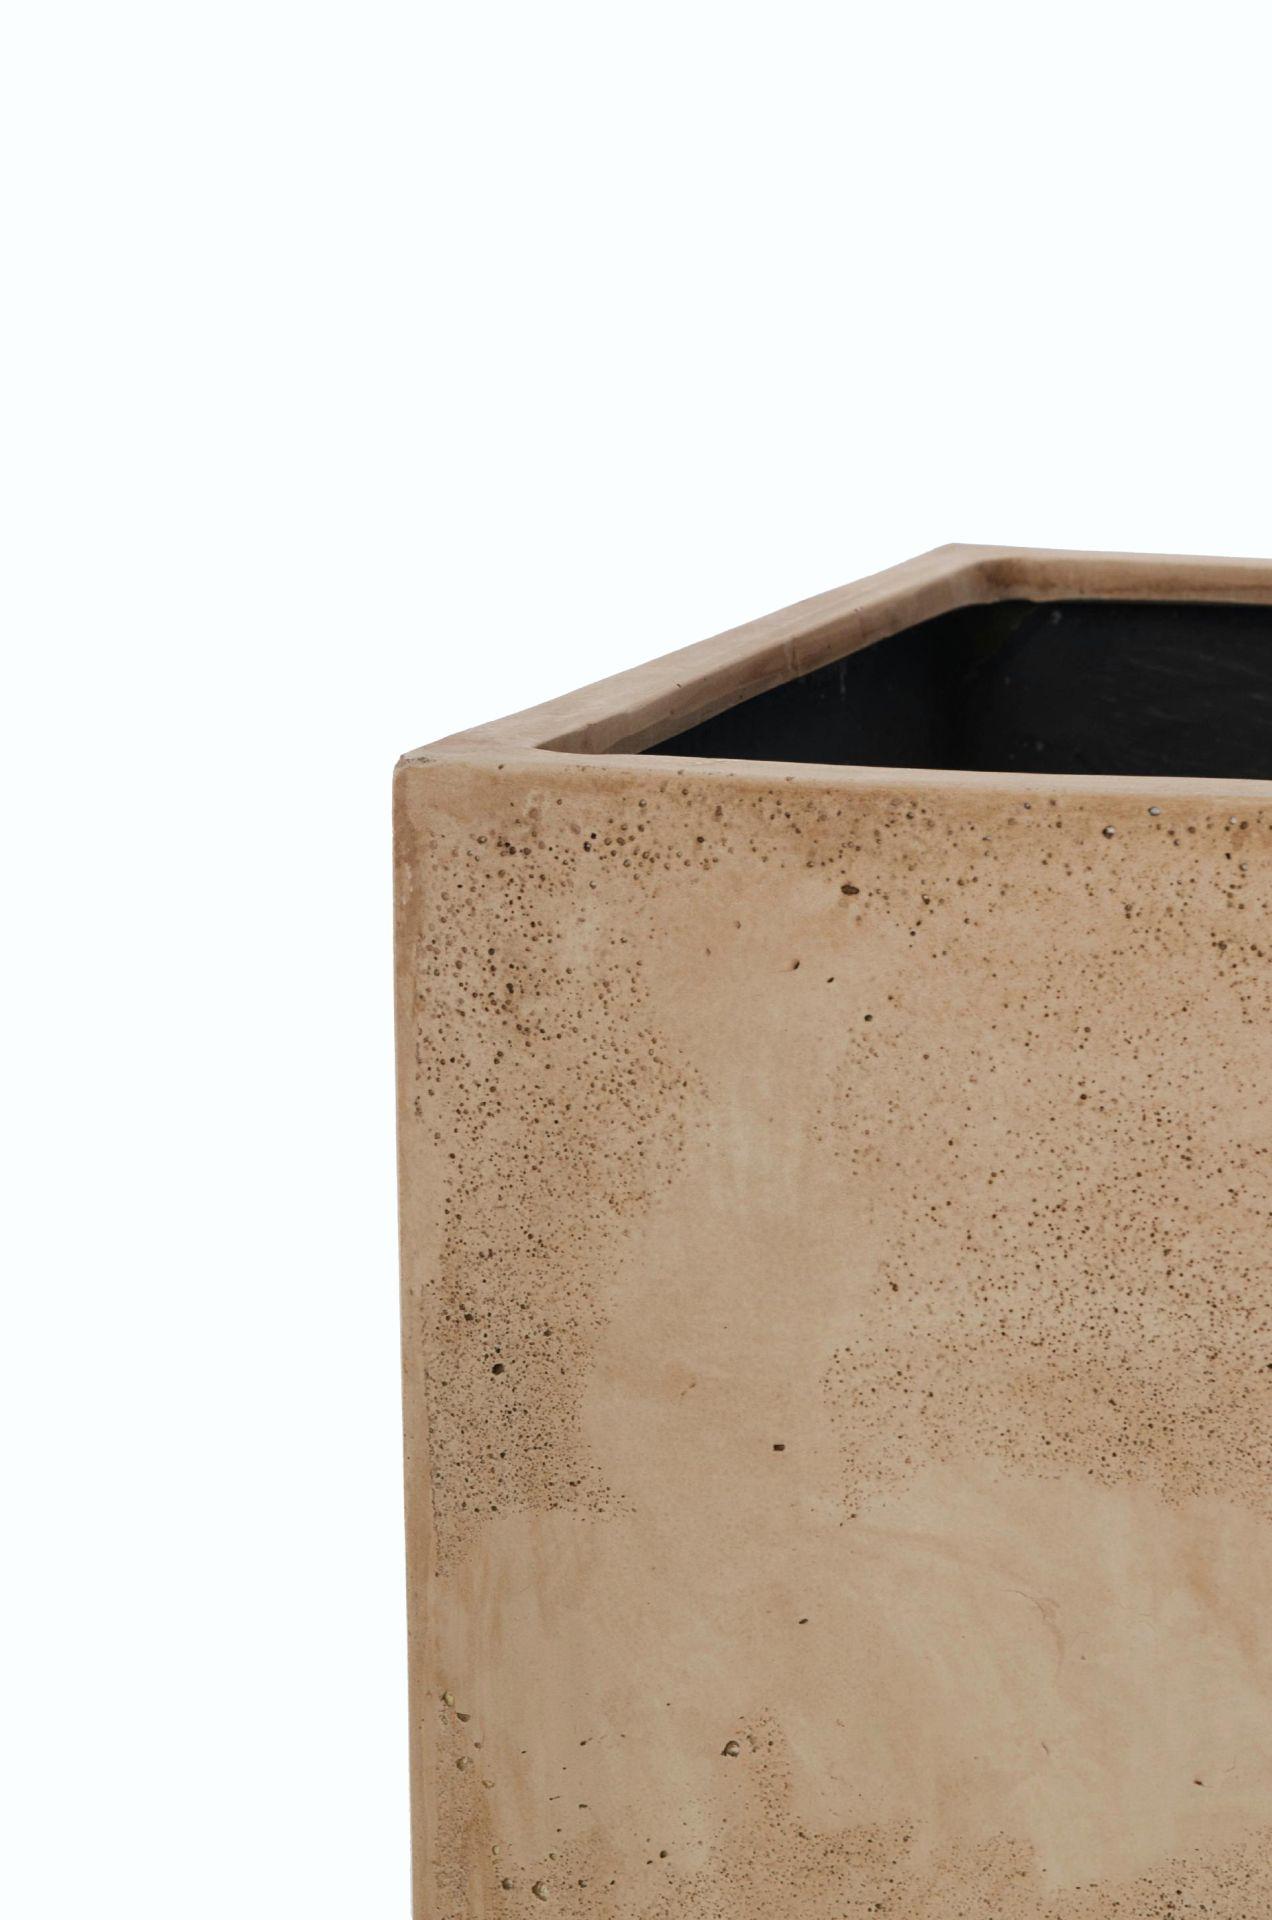 pflanzk bel blumenk bel block 50 50 fiberglas beton design beige ebay. Black Bedroom Furniture Sets. Home Design Ideas